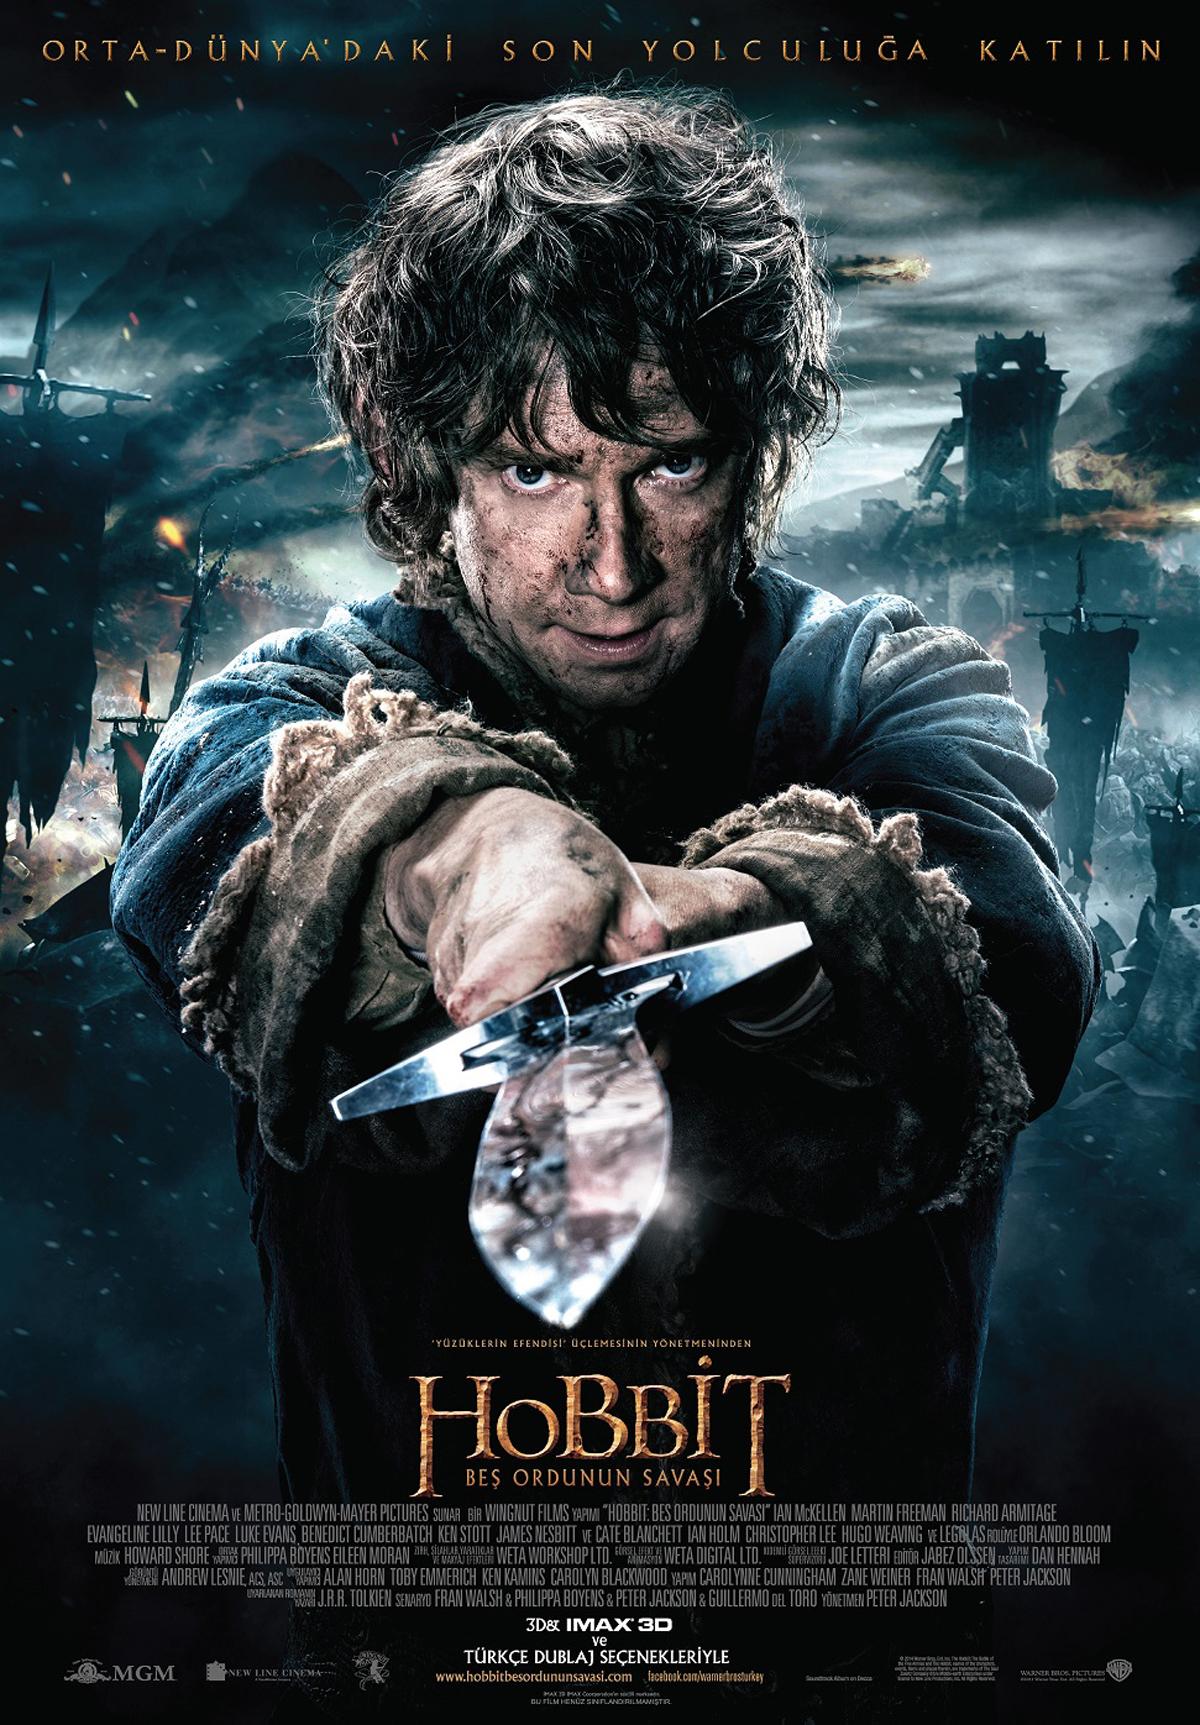 hobbit bes ordunun savasi filmi icin benzer filmler beyazperde com